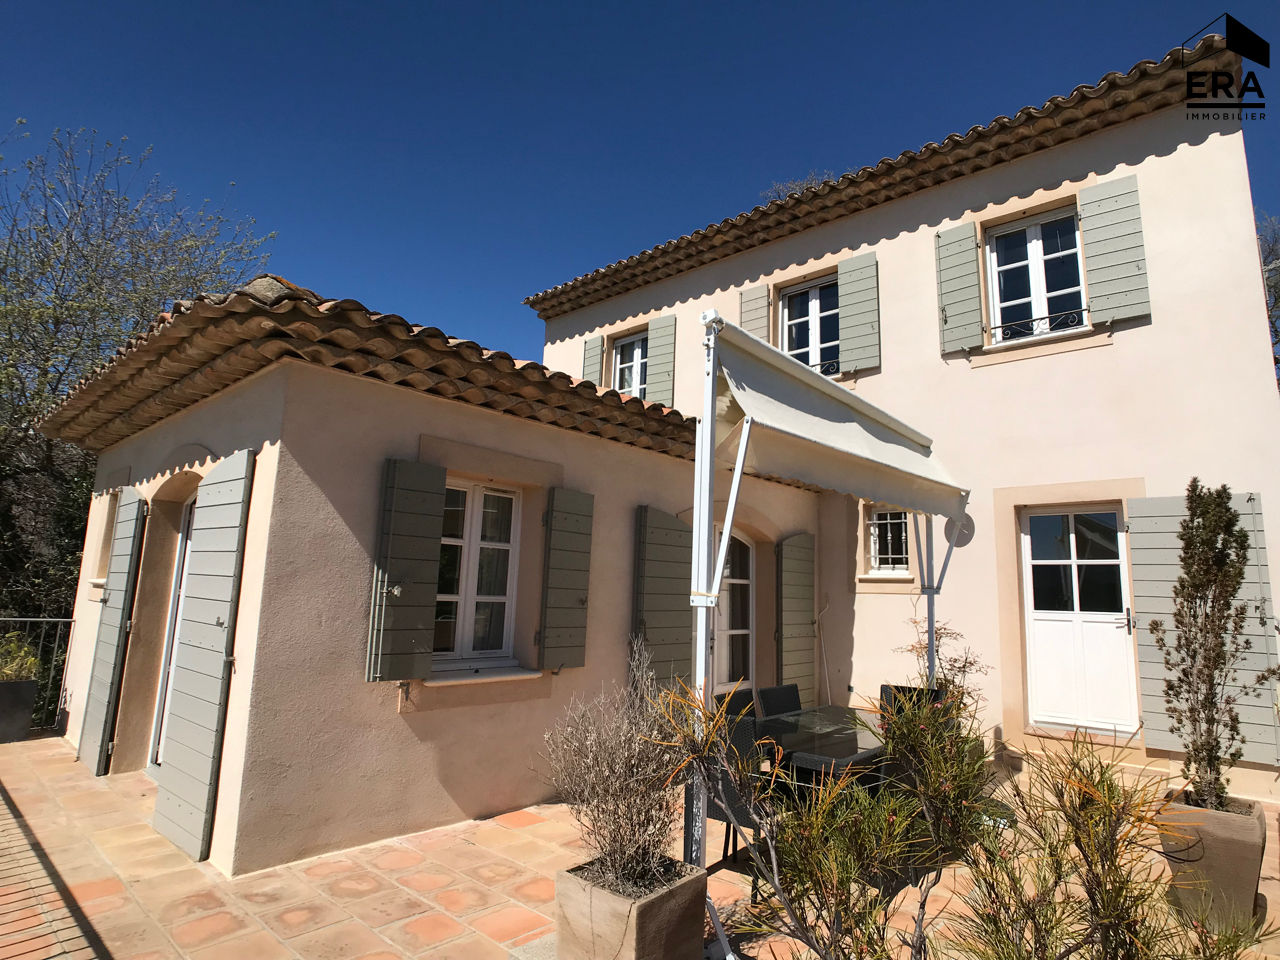 Villa 4 chambres avec piscine et grande terrasse couverte for Villa avec terrasse couverte